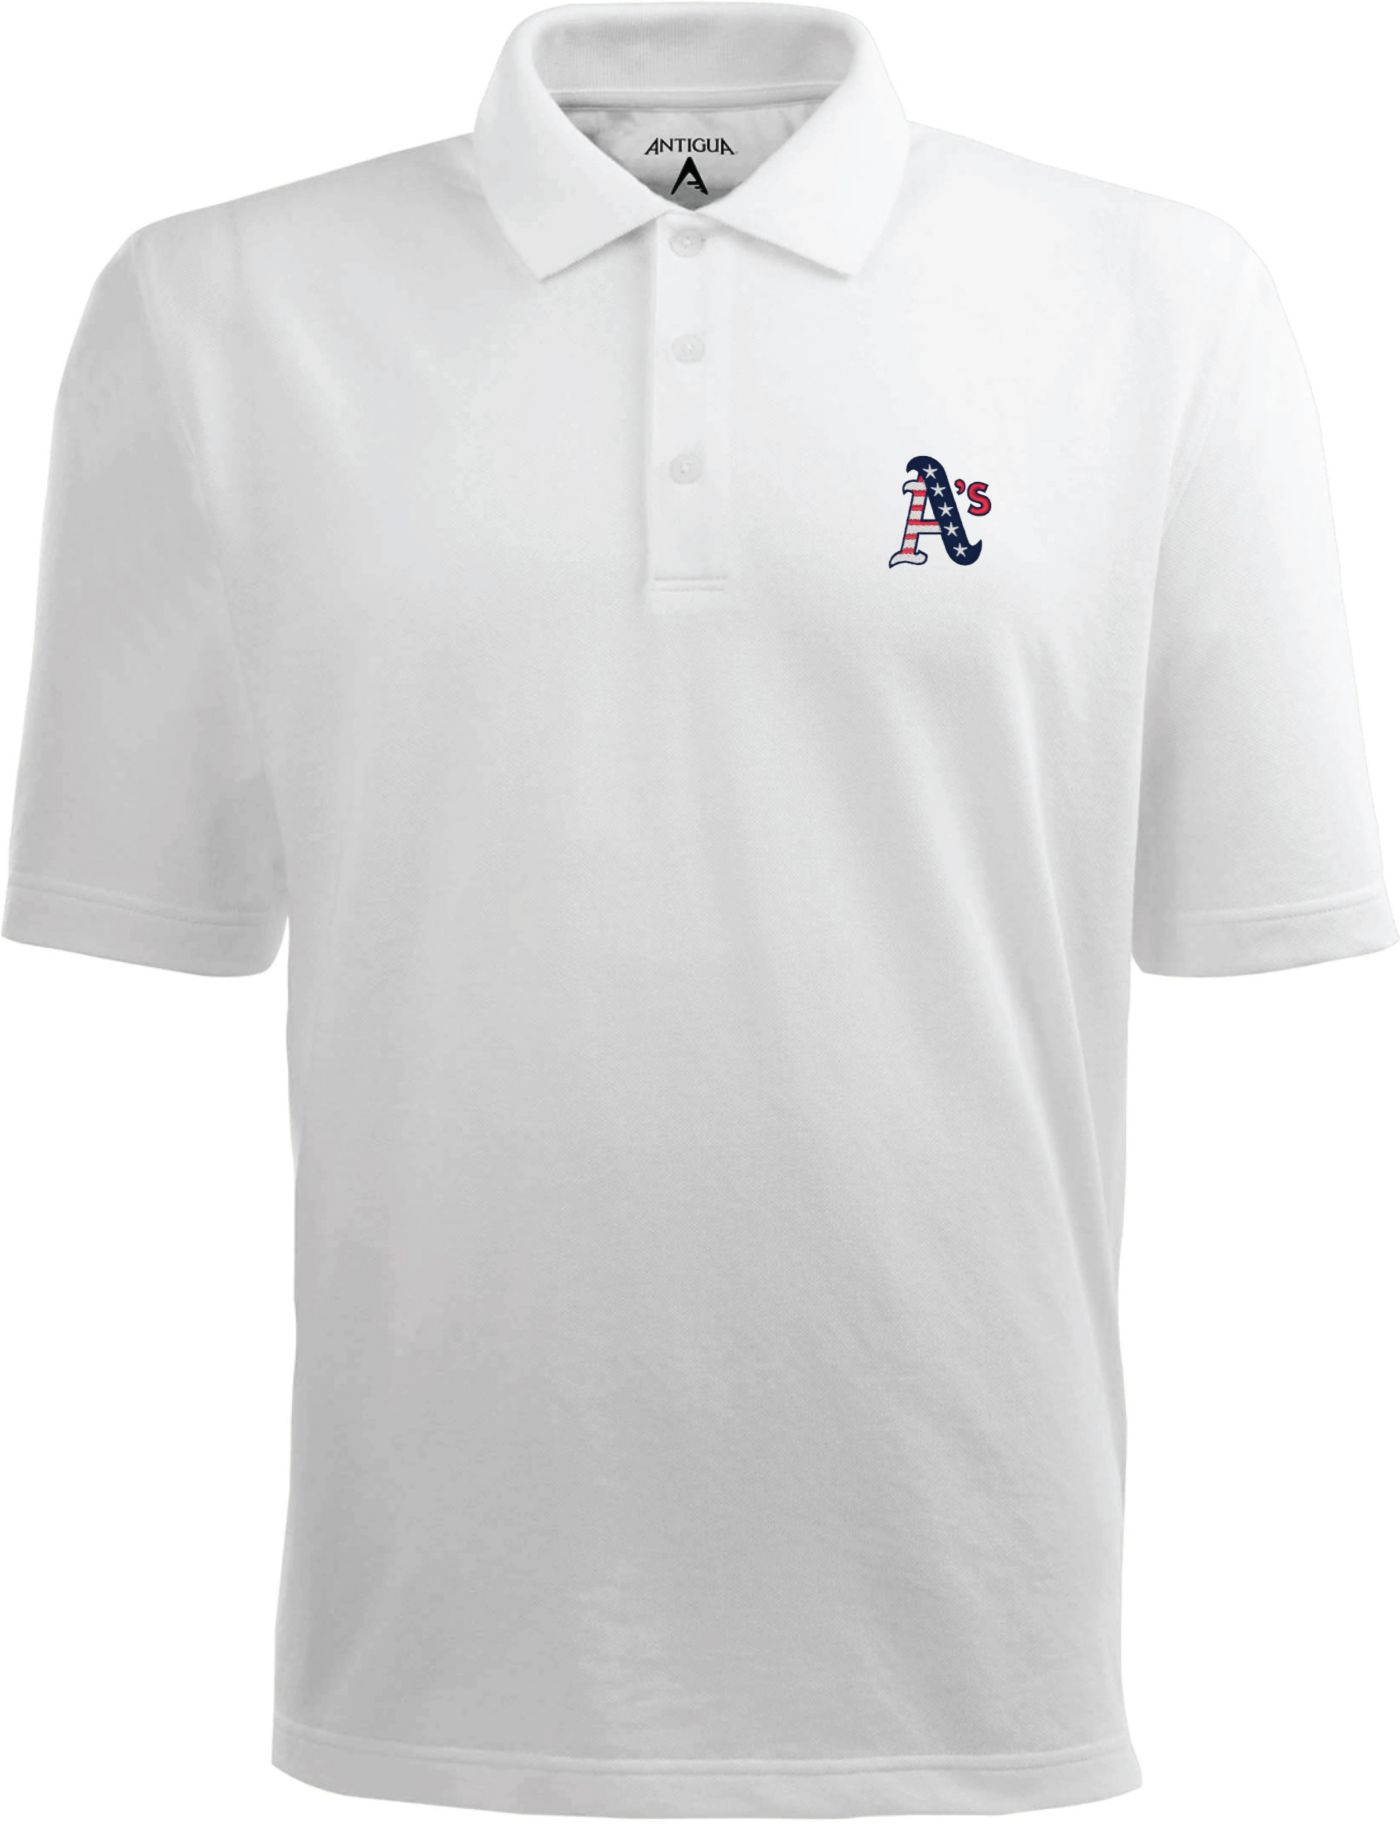 Antigua Men's Oakland Athletics Xtra-Lite Patriotic Logo White Pique Performance Polo